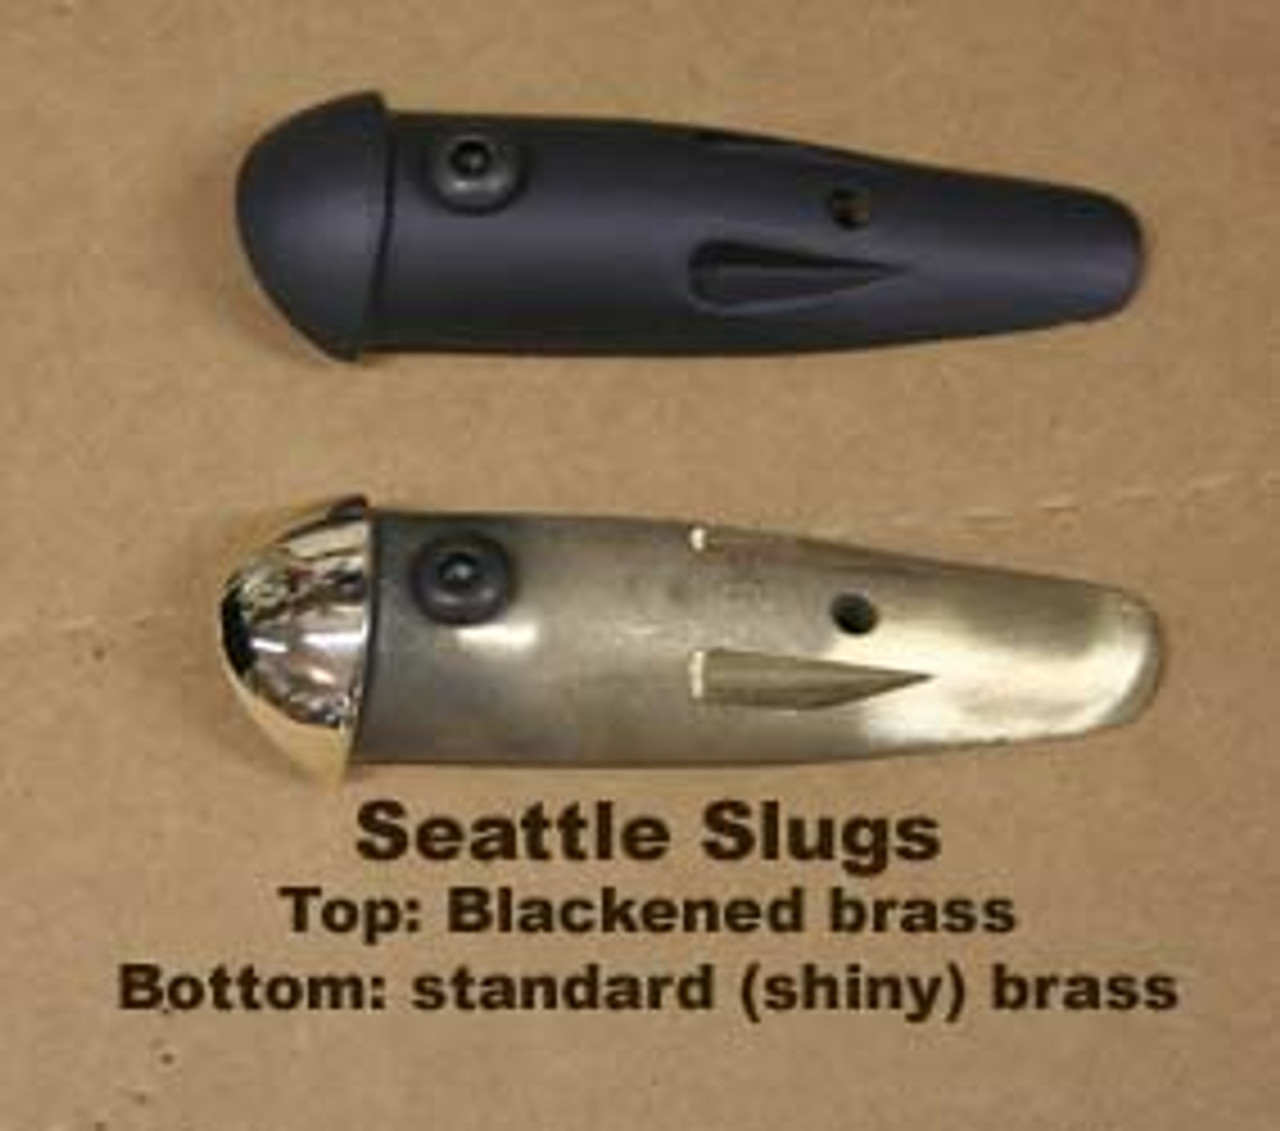 Glock - SEATTLE SLUG MAG GUIDE 19/23: GEN 3 BLACKENED BRASS